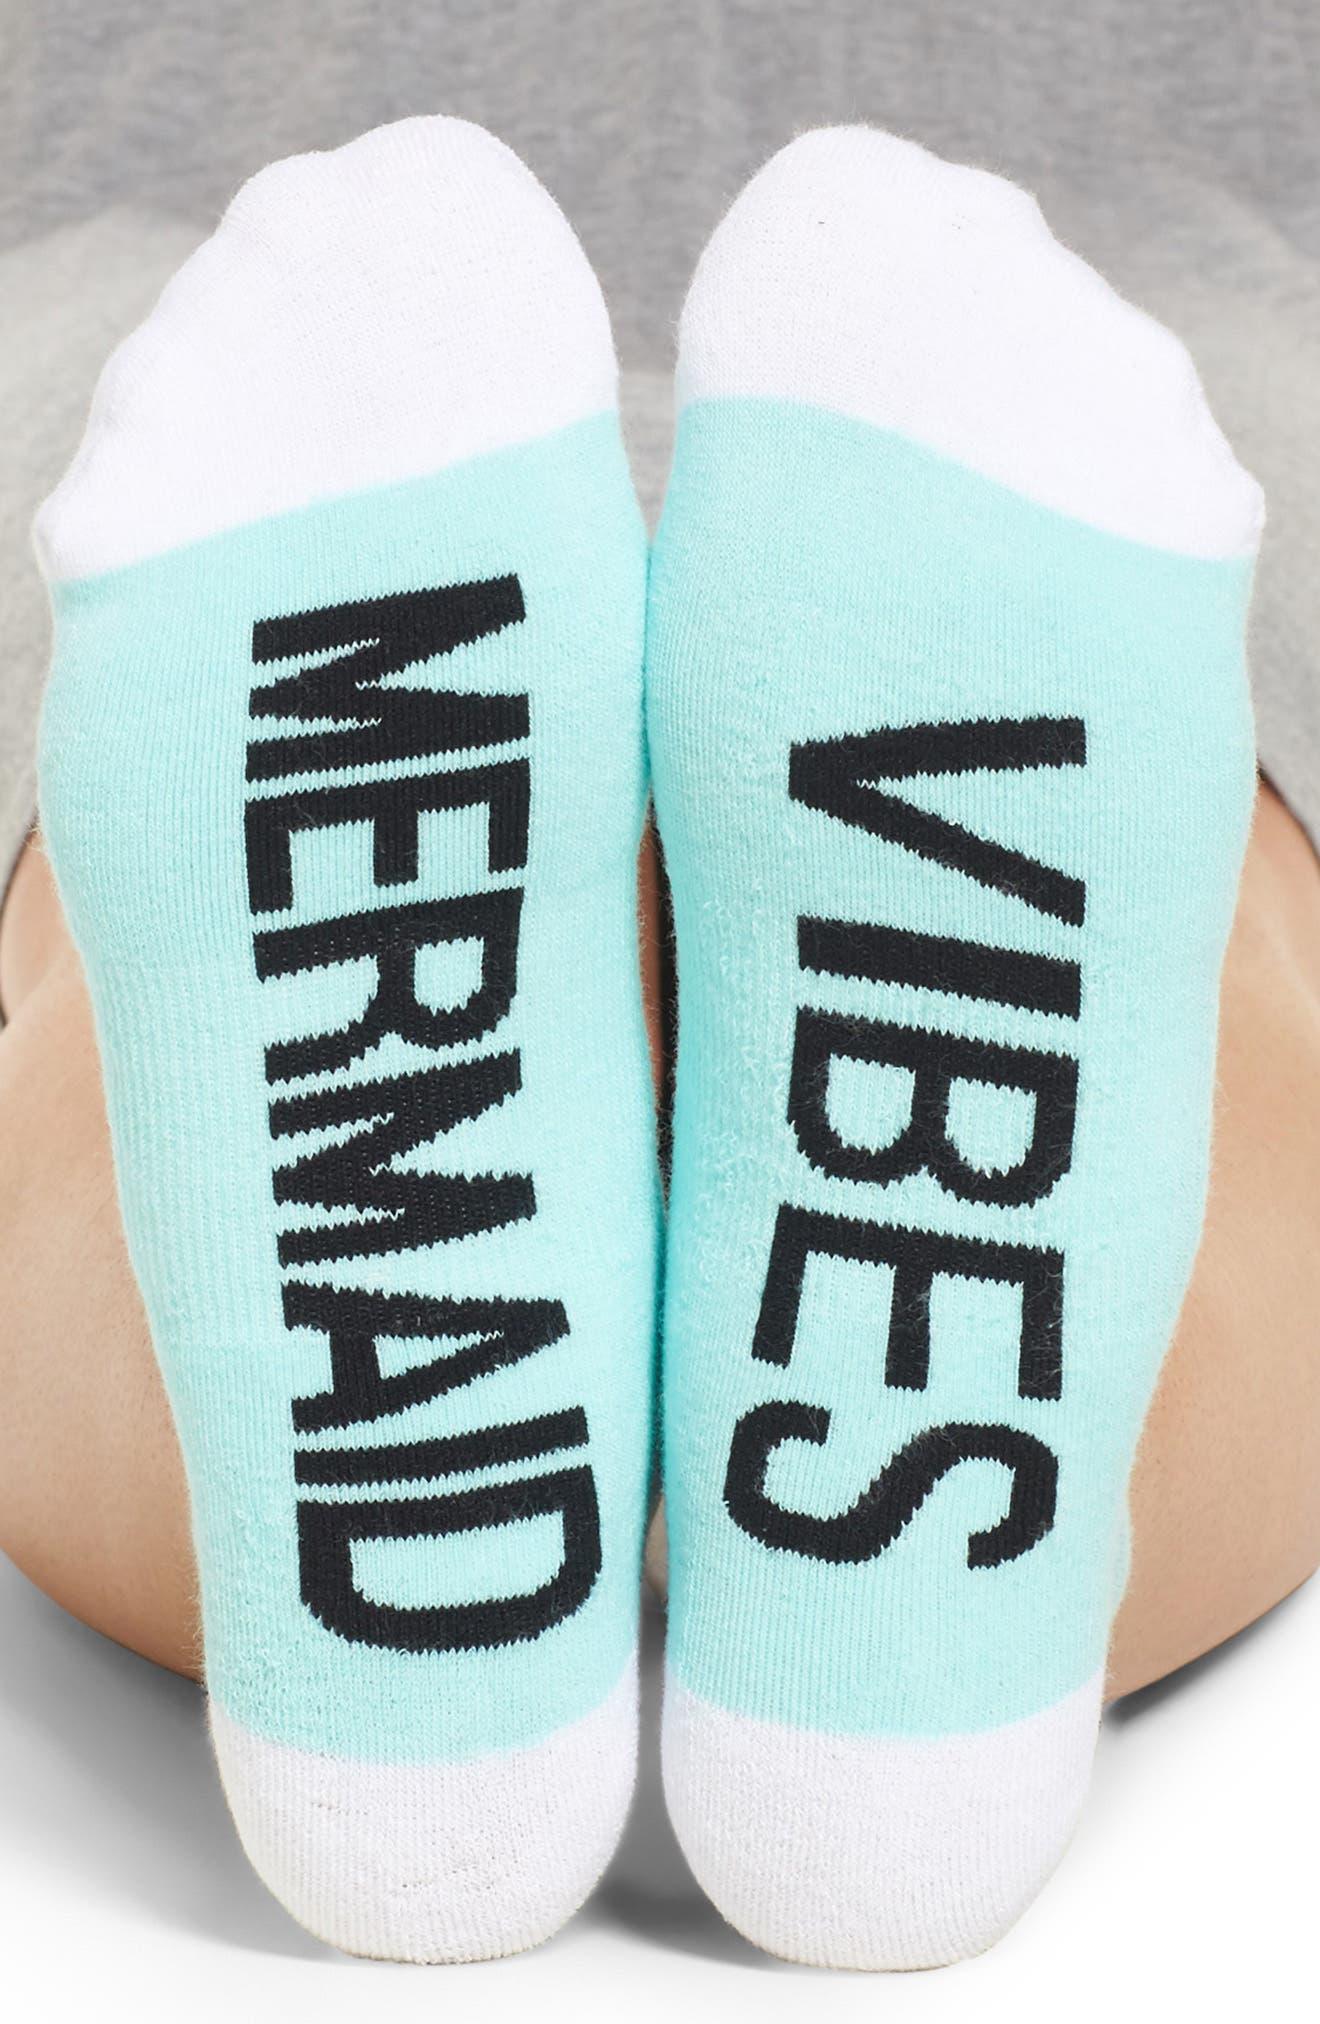 Mermaid Vibes Ankle Socks,                             Main thumbnail 1, color,                             Mint